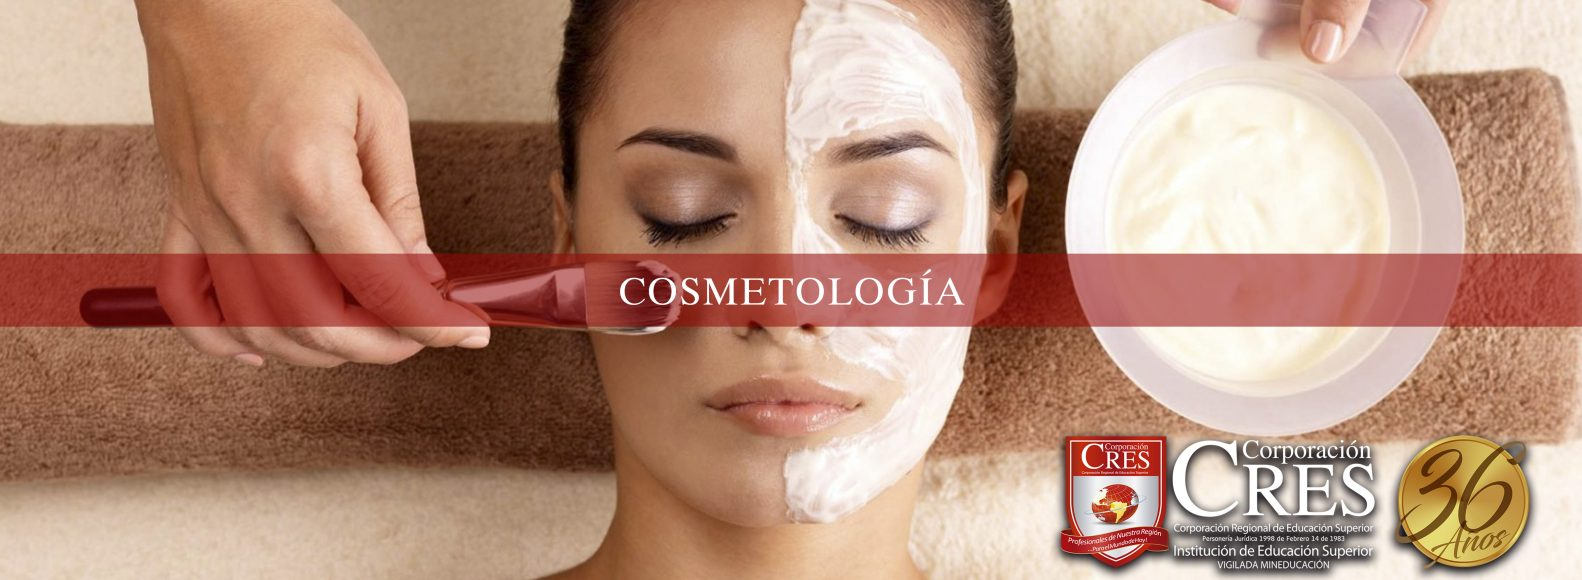 Slide_3_cosmetologia